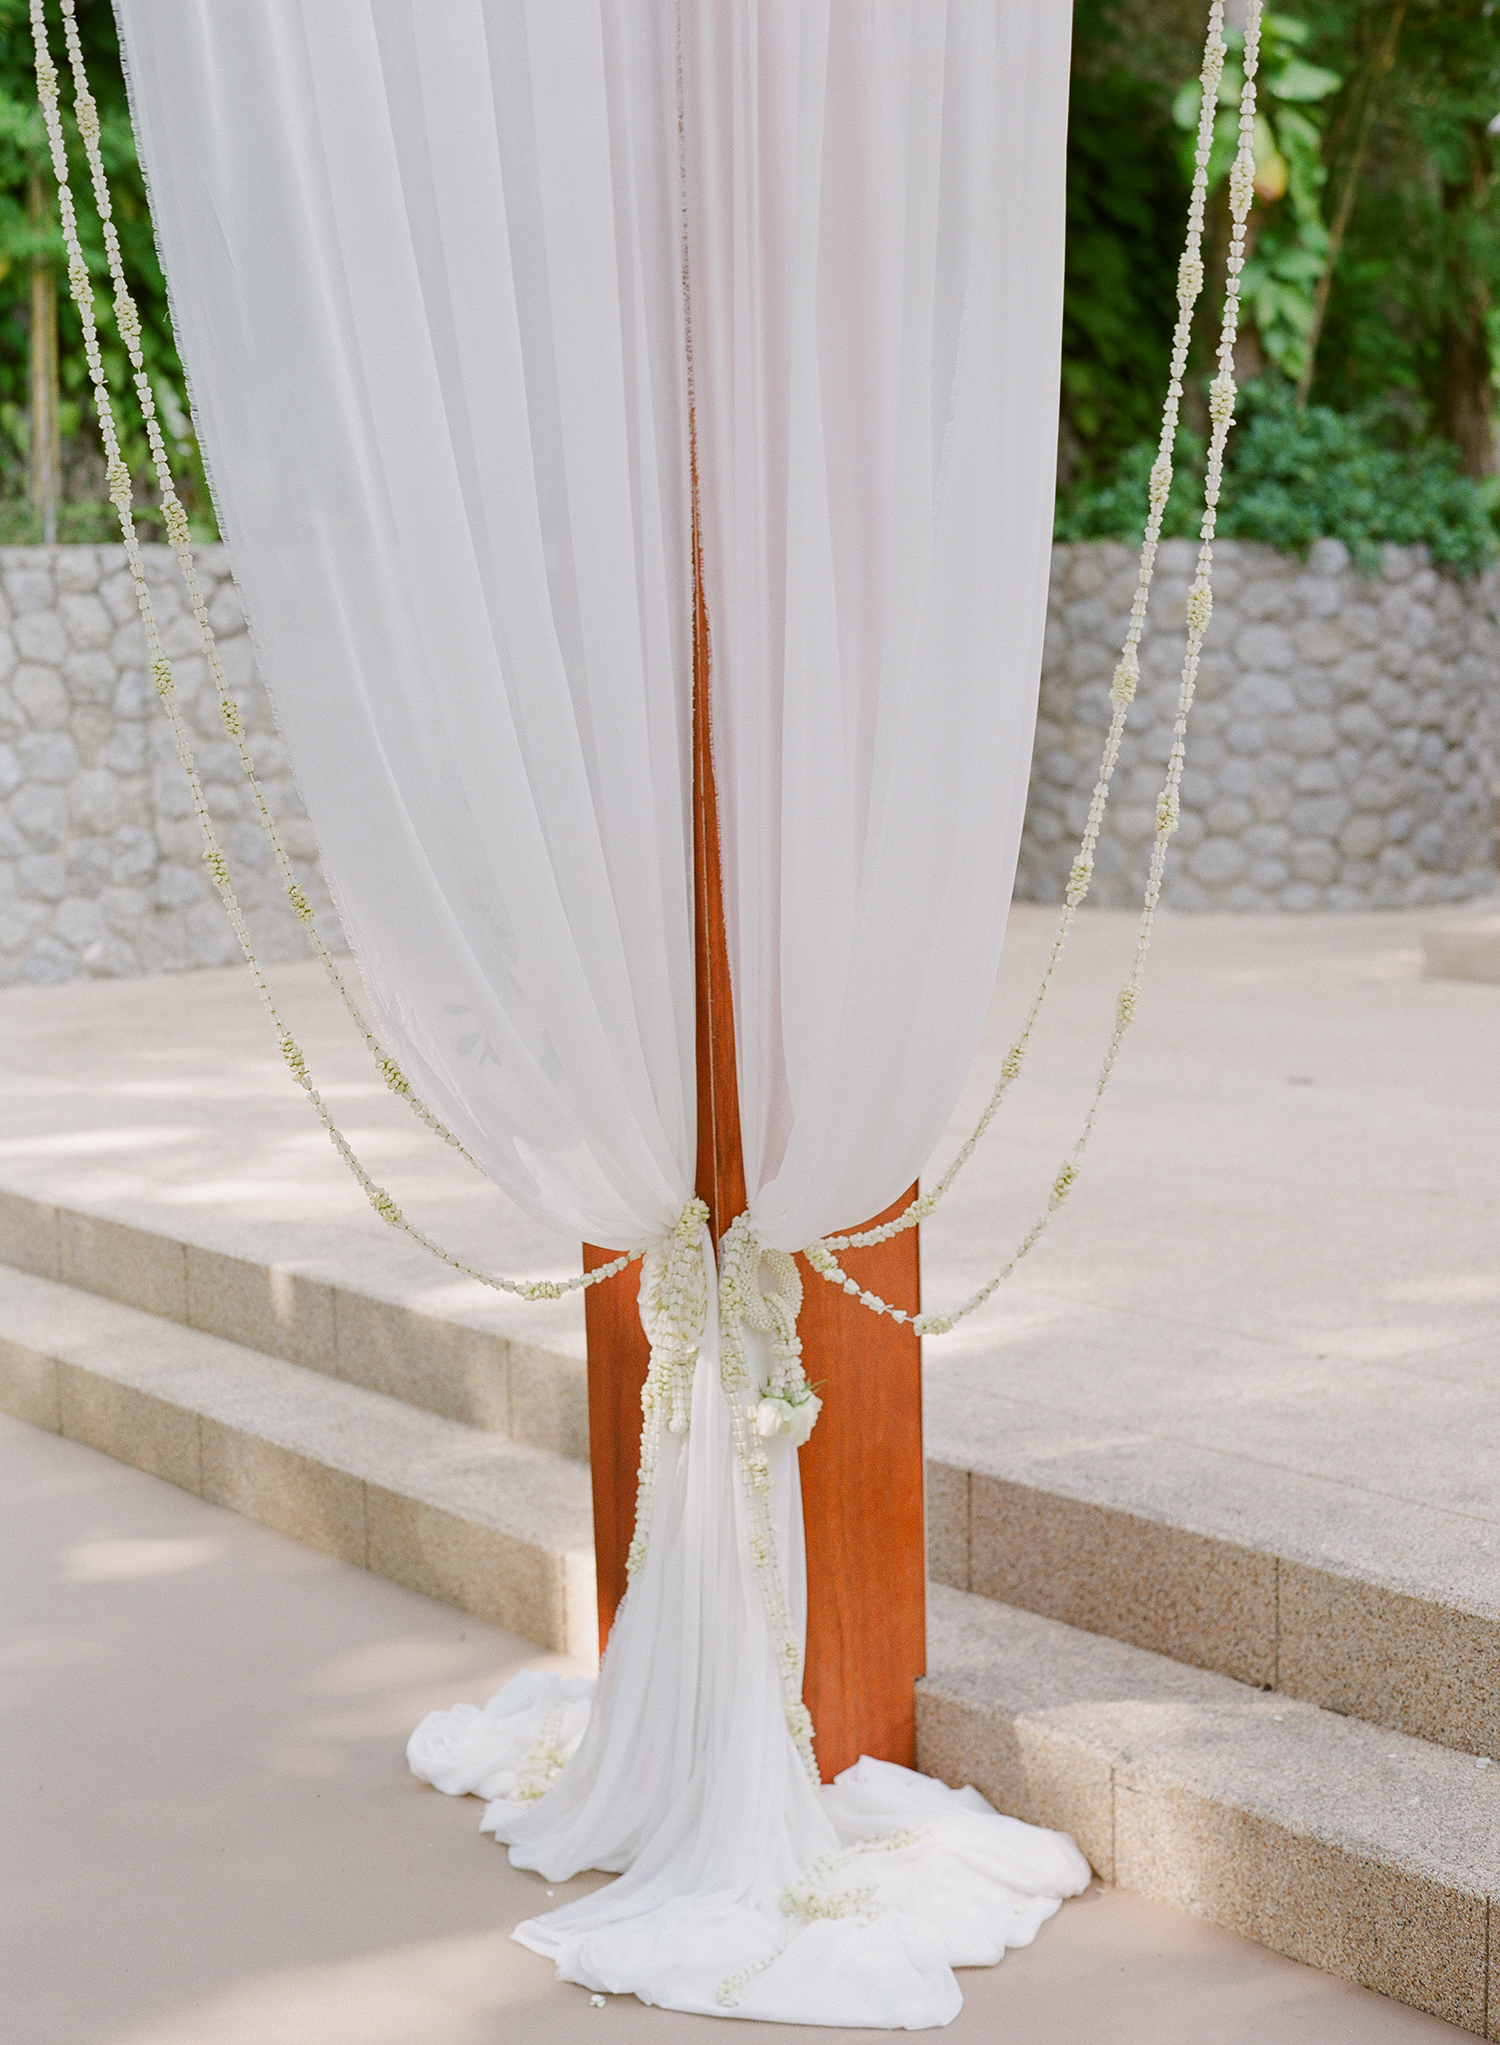 stacy brad wedding thailand draping on pole